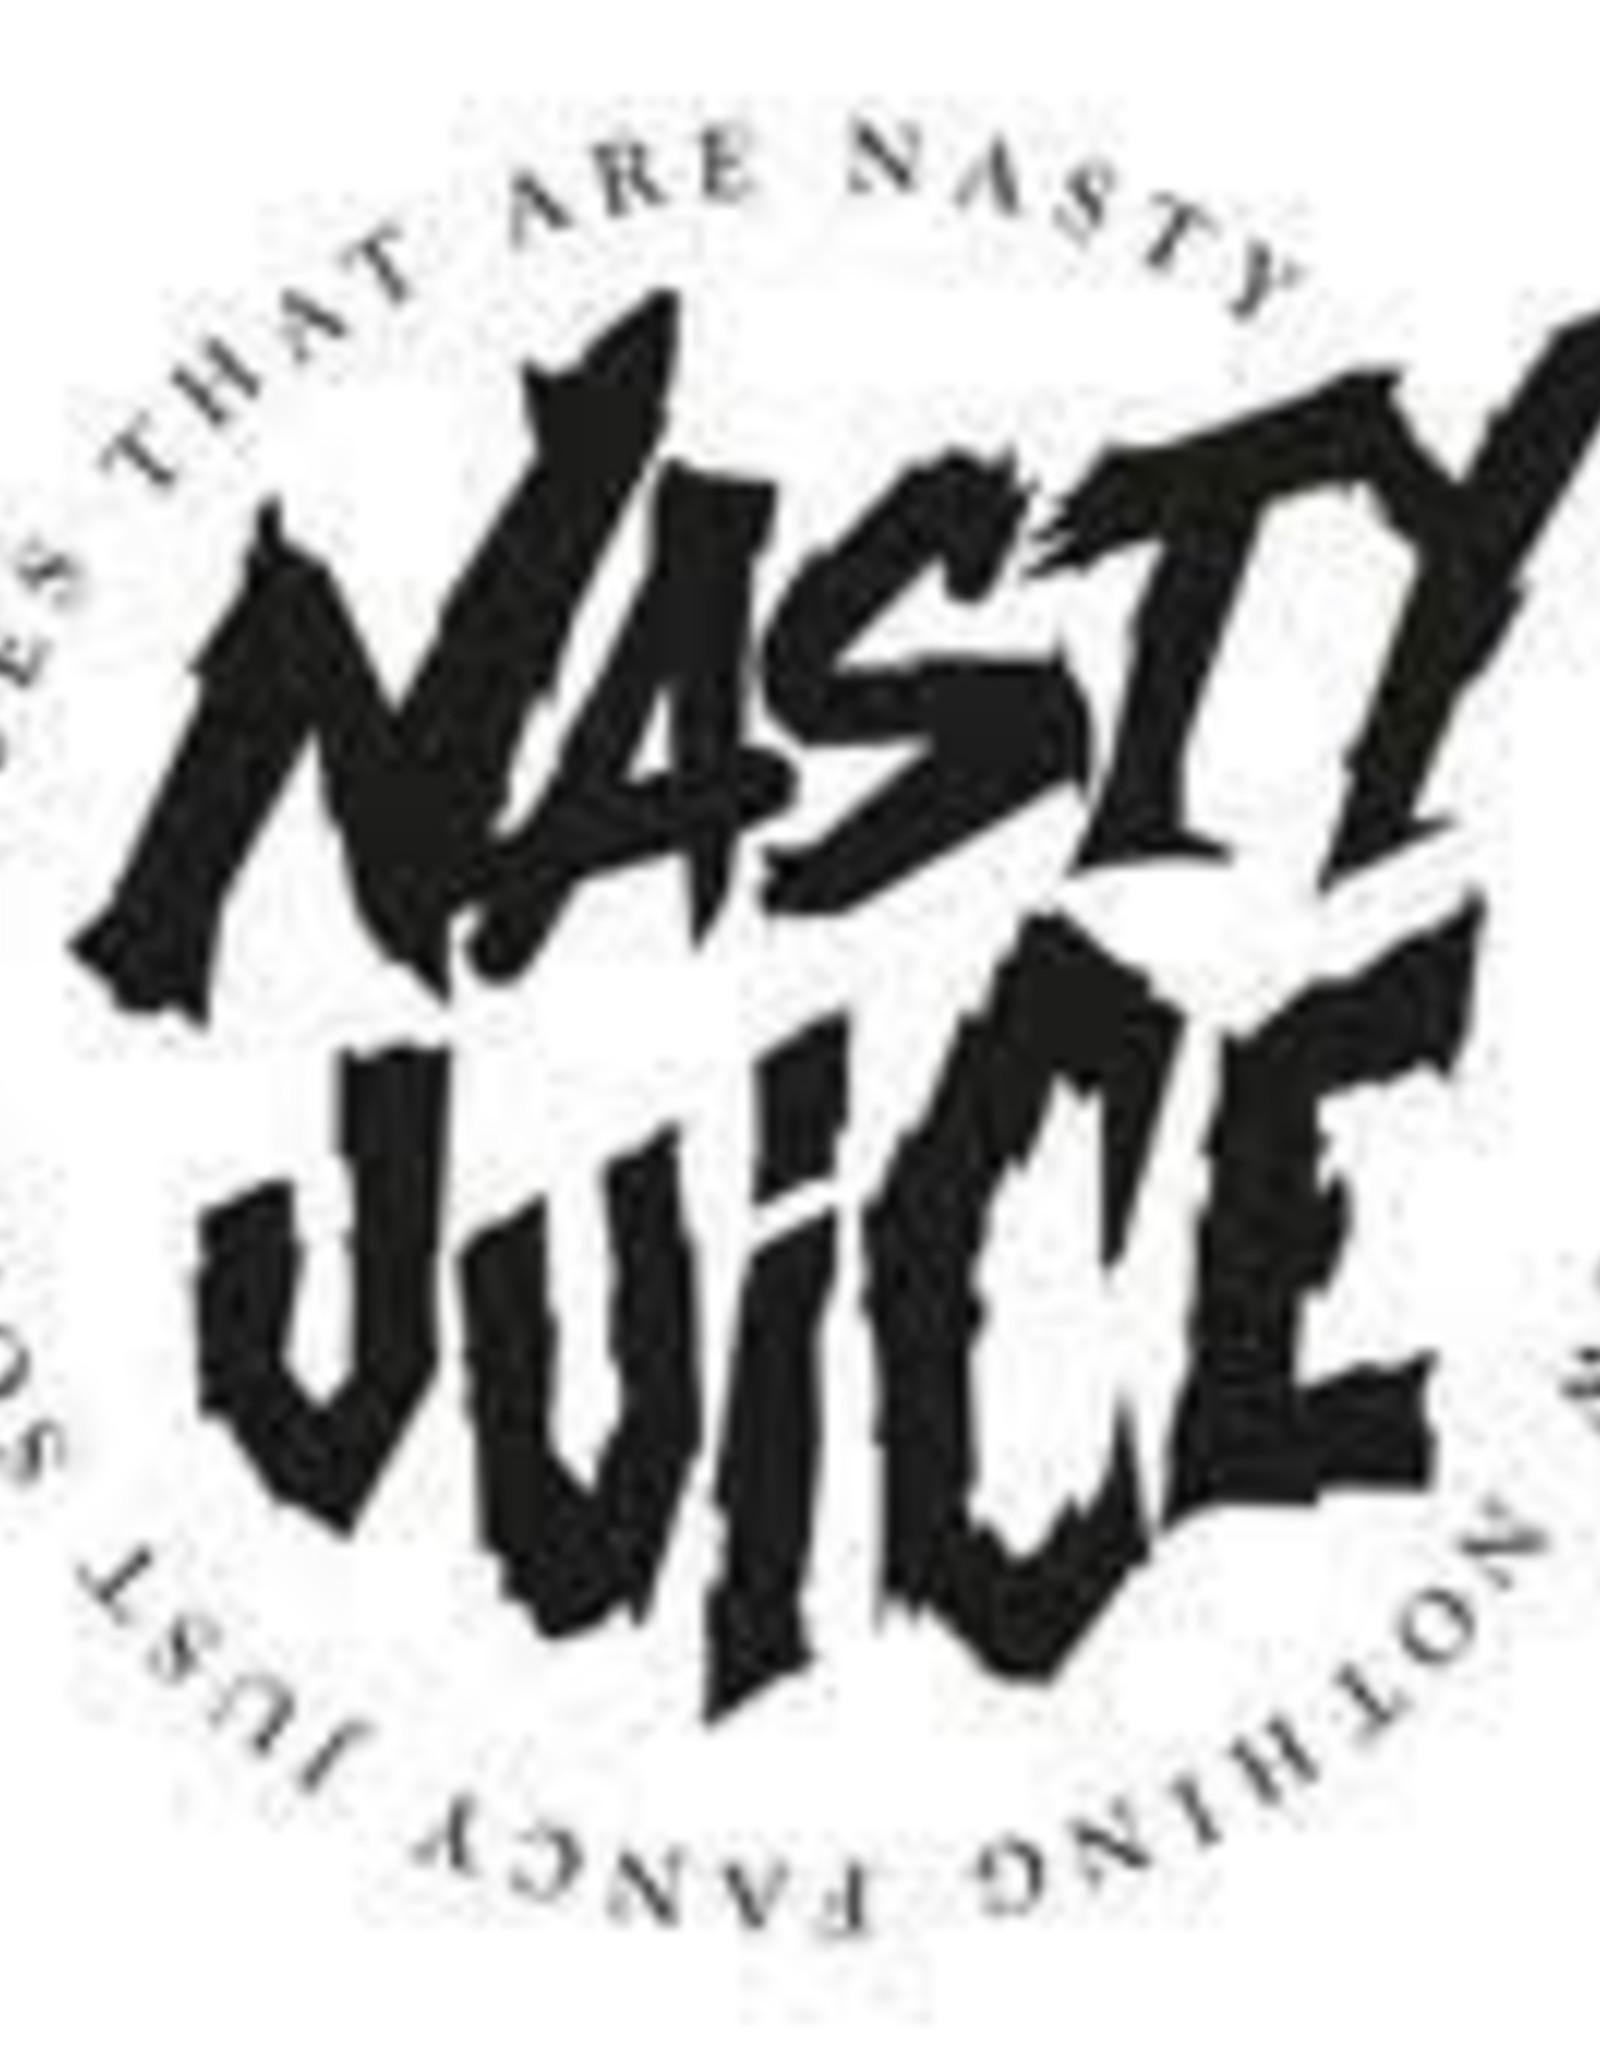 Nasty Nasty Juice